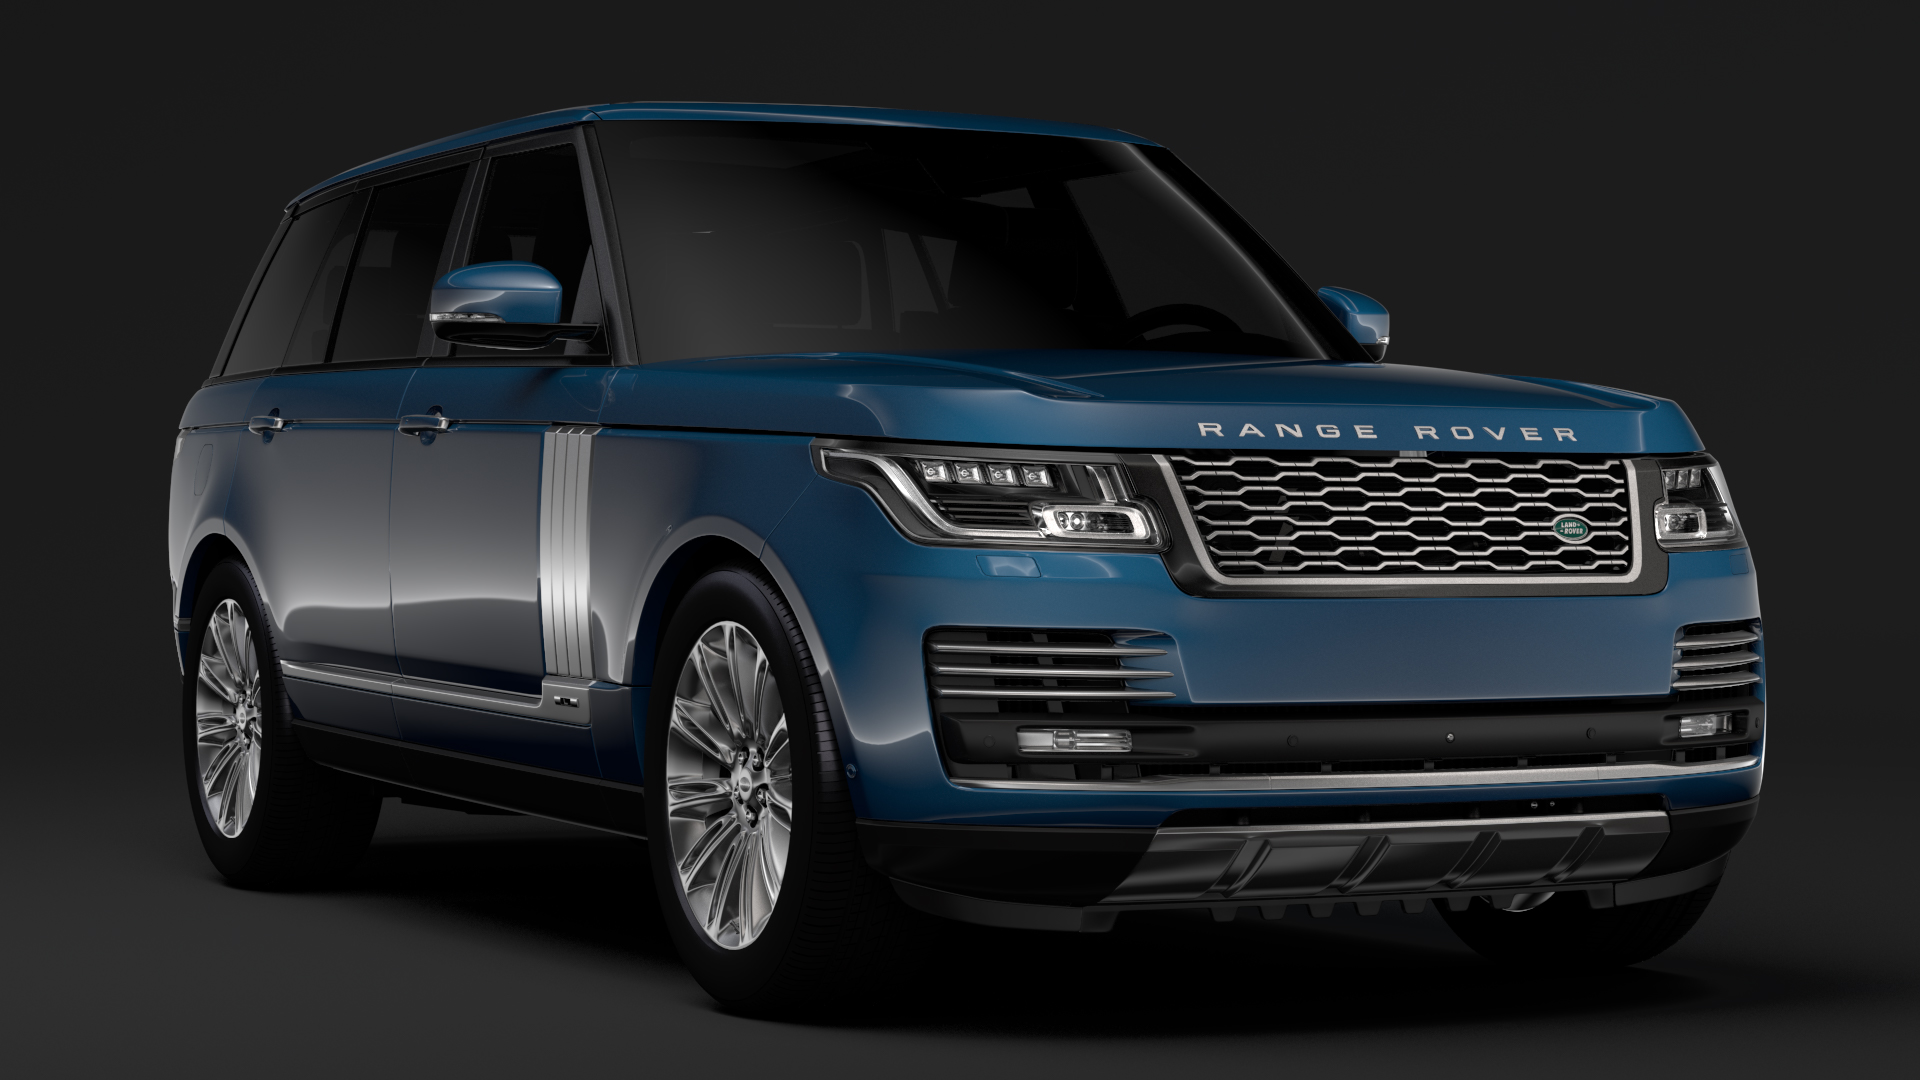 range rover autobiography lwb l405 2018 3d model max fbx c4d lwo ma mb hrc xsi obj 277324